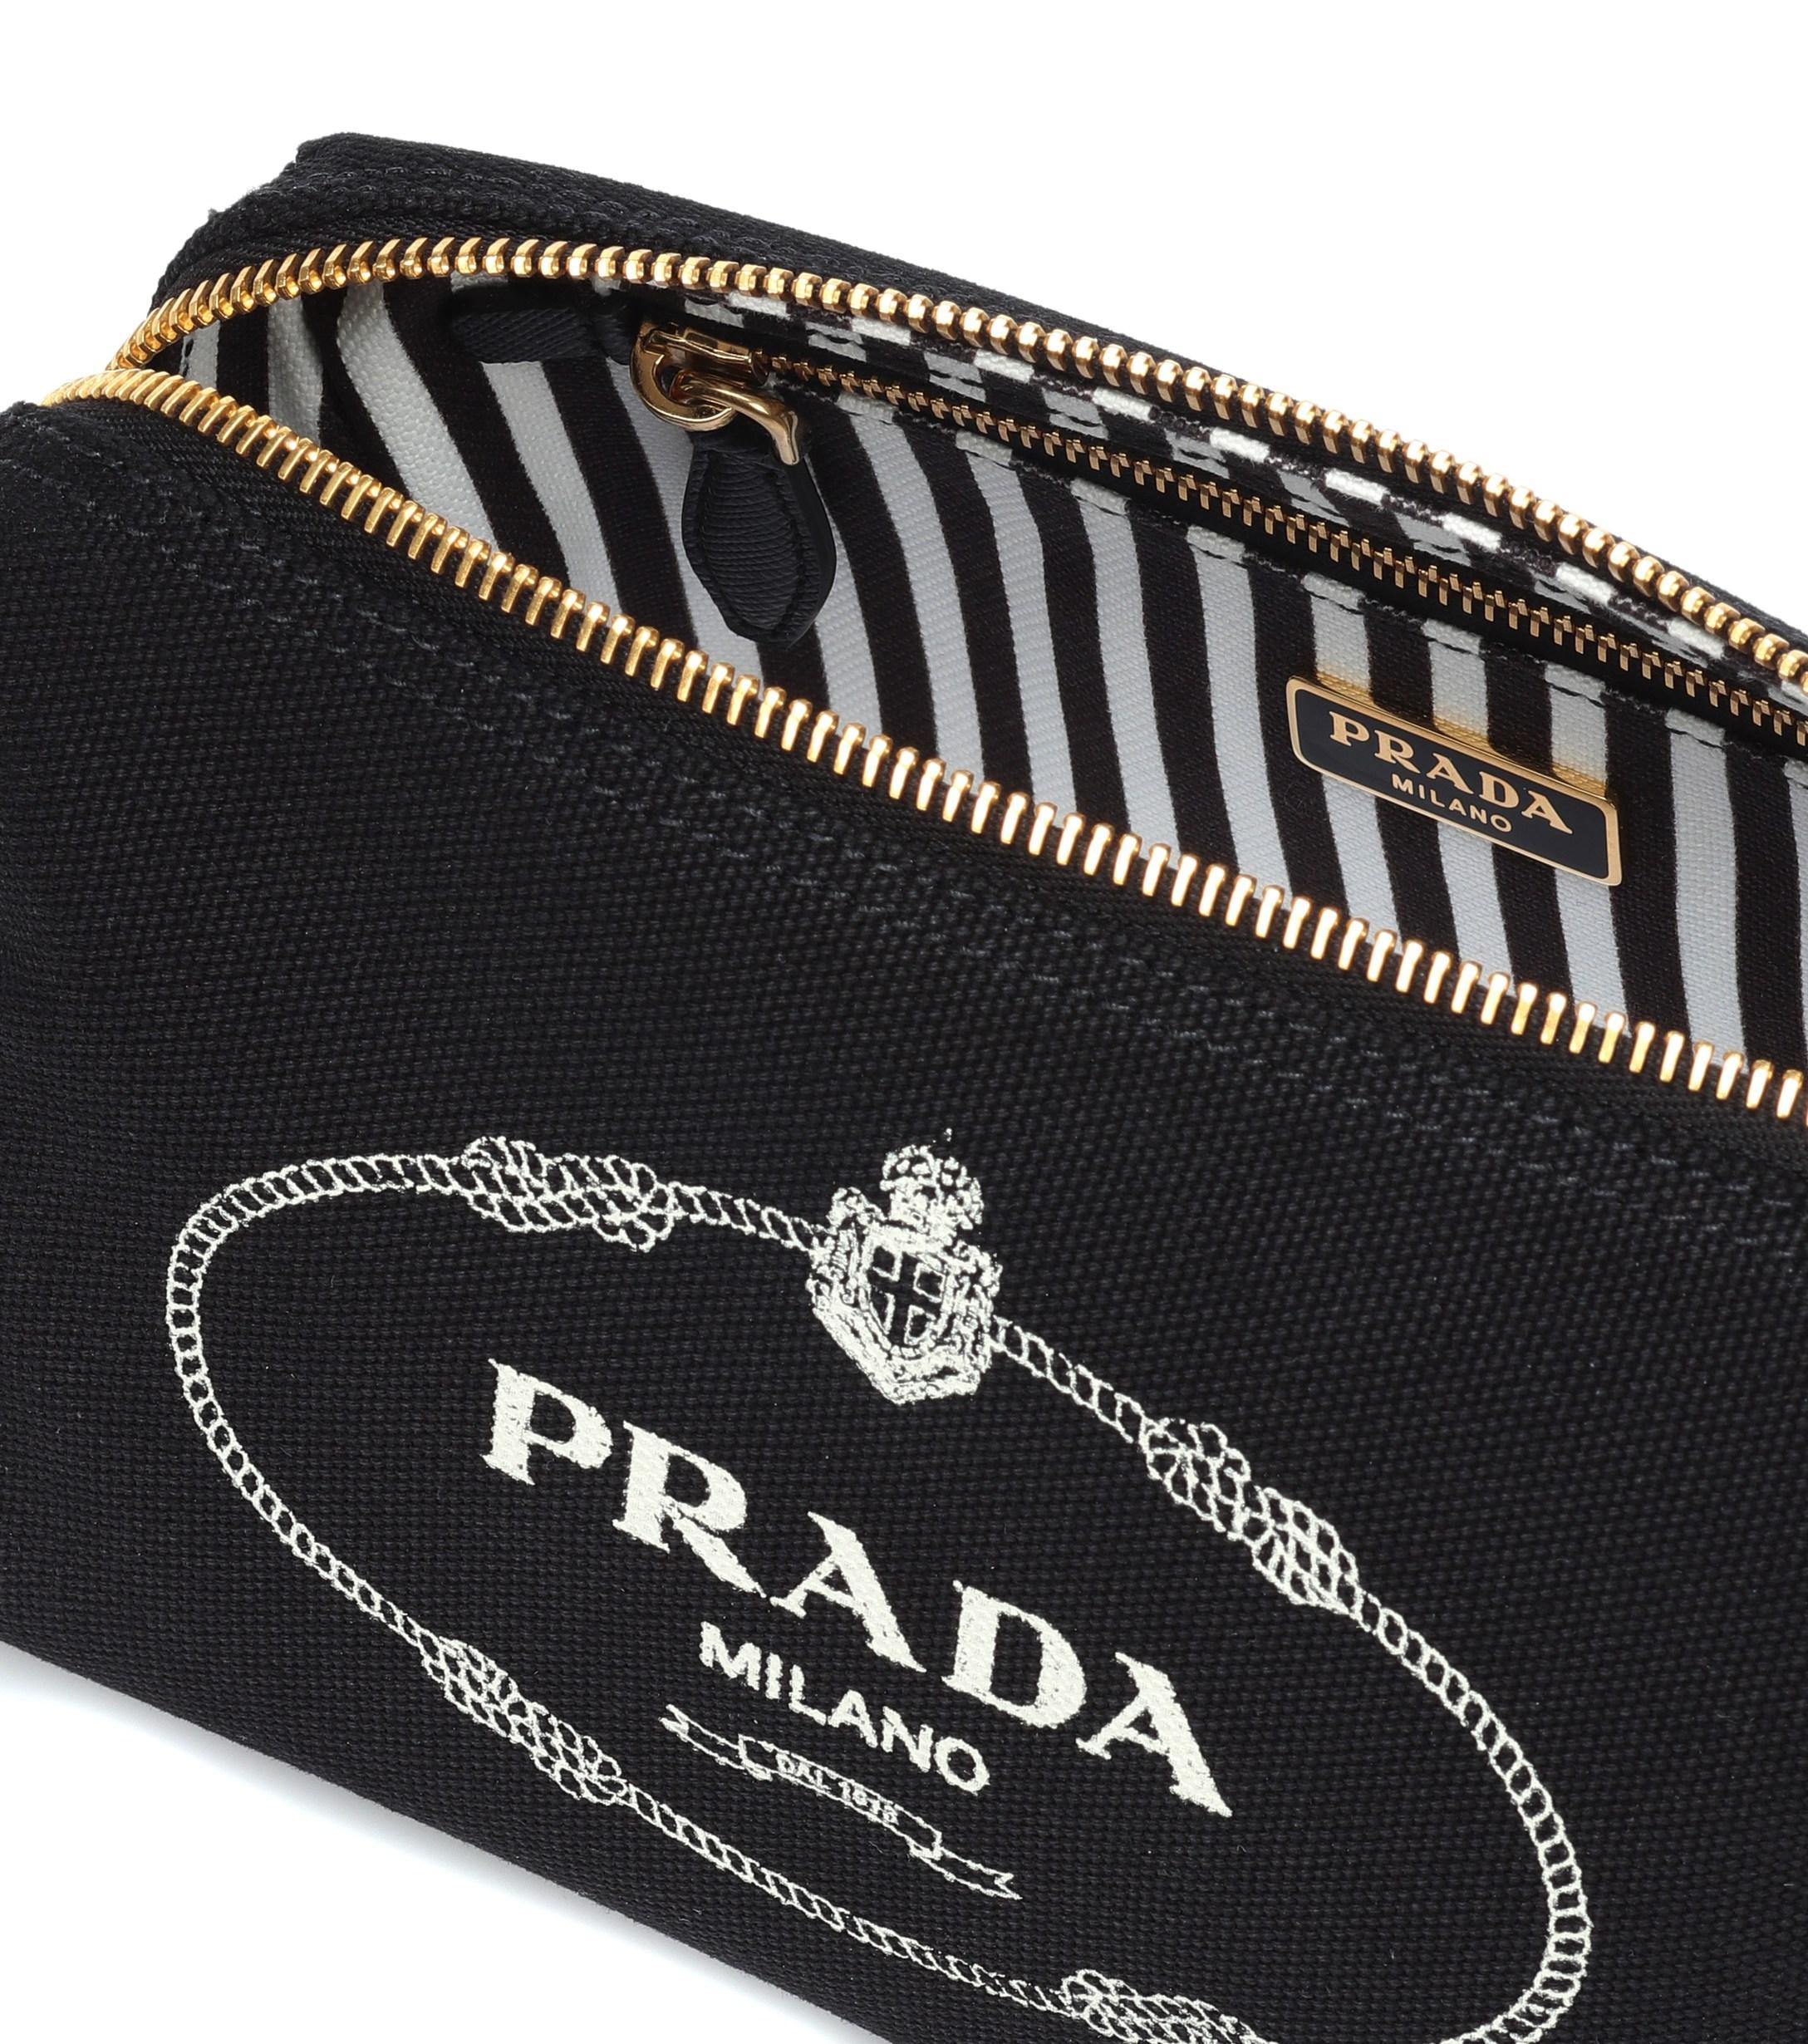 a011f1a0de5b Prada - Black Logo Canvas Cosmetics Case - Lyst. View fullscreen